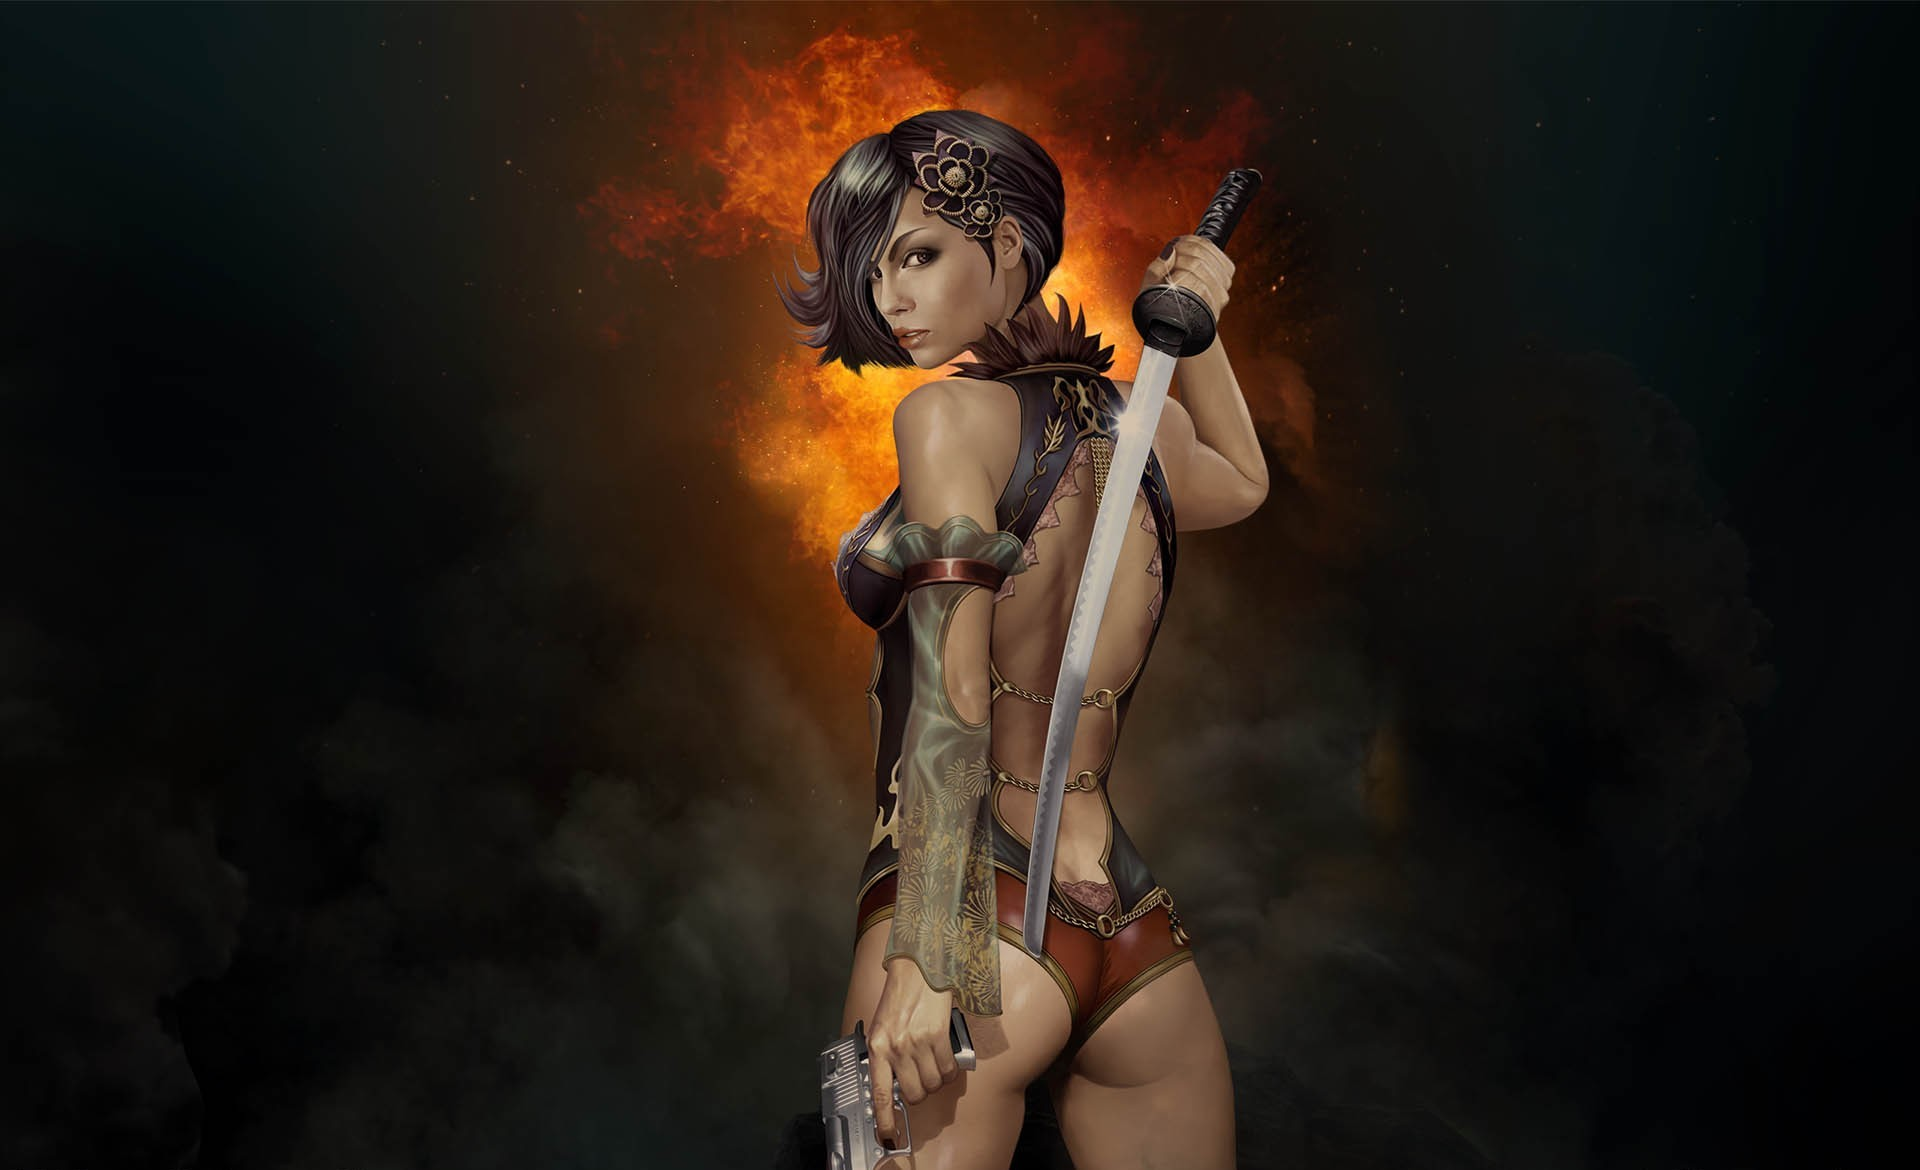 Hot cartoon girl hd wallpaper naked game porn gallery